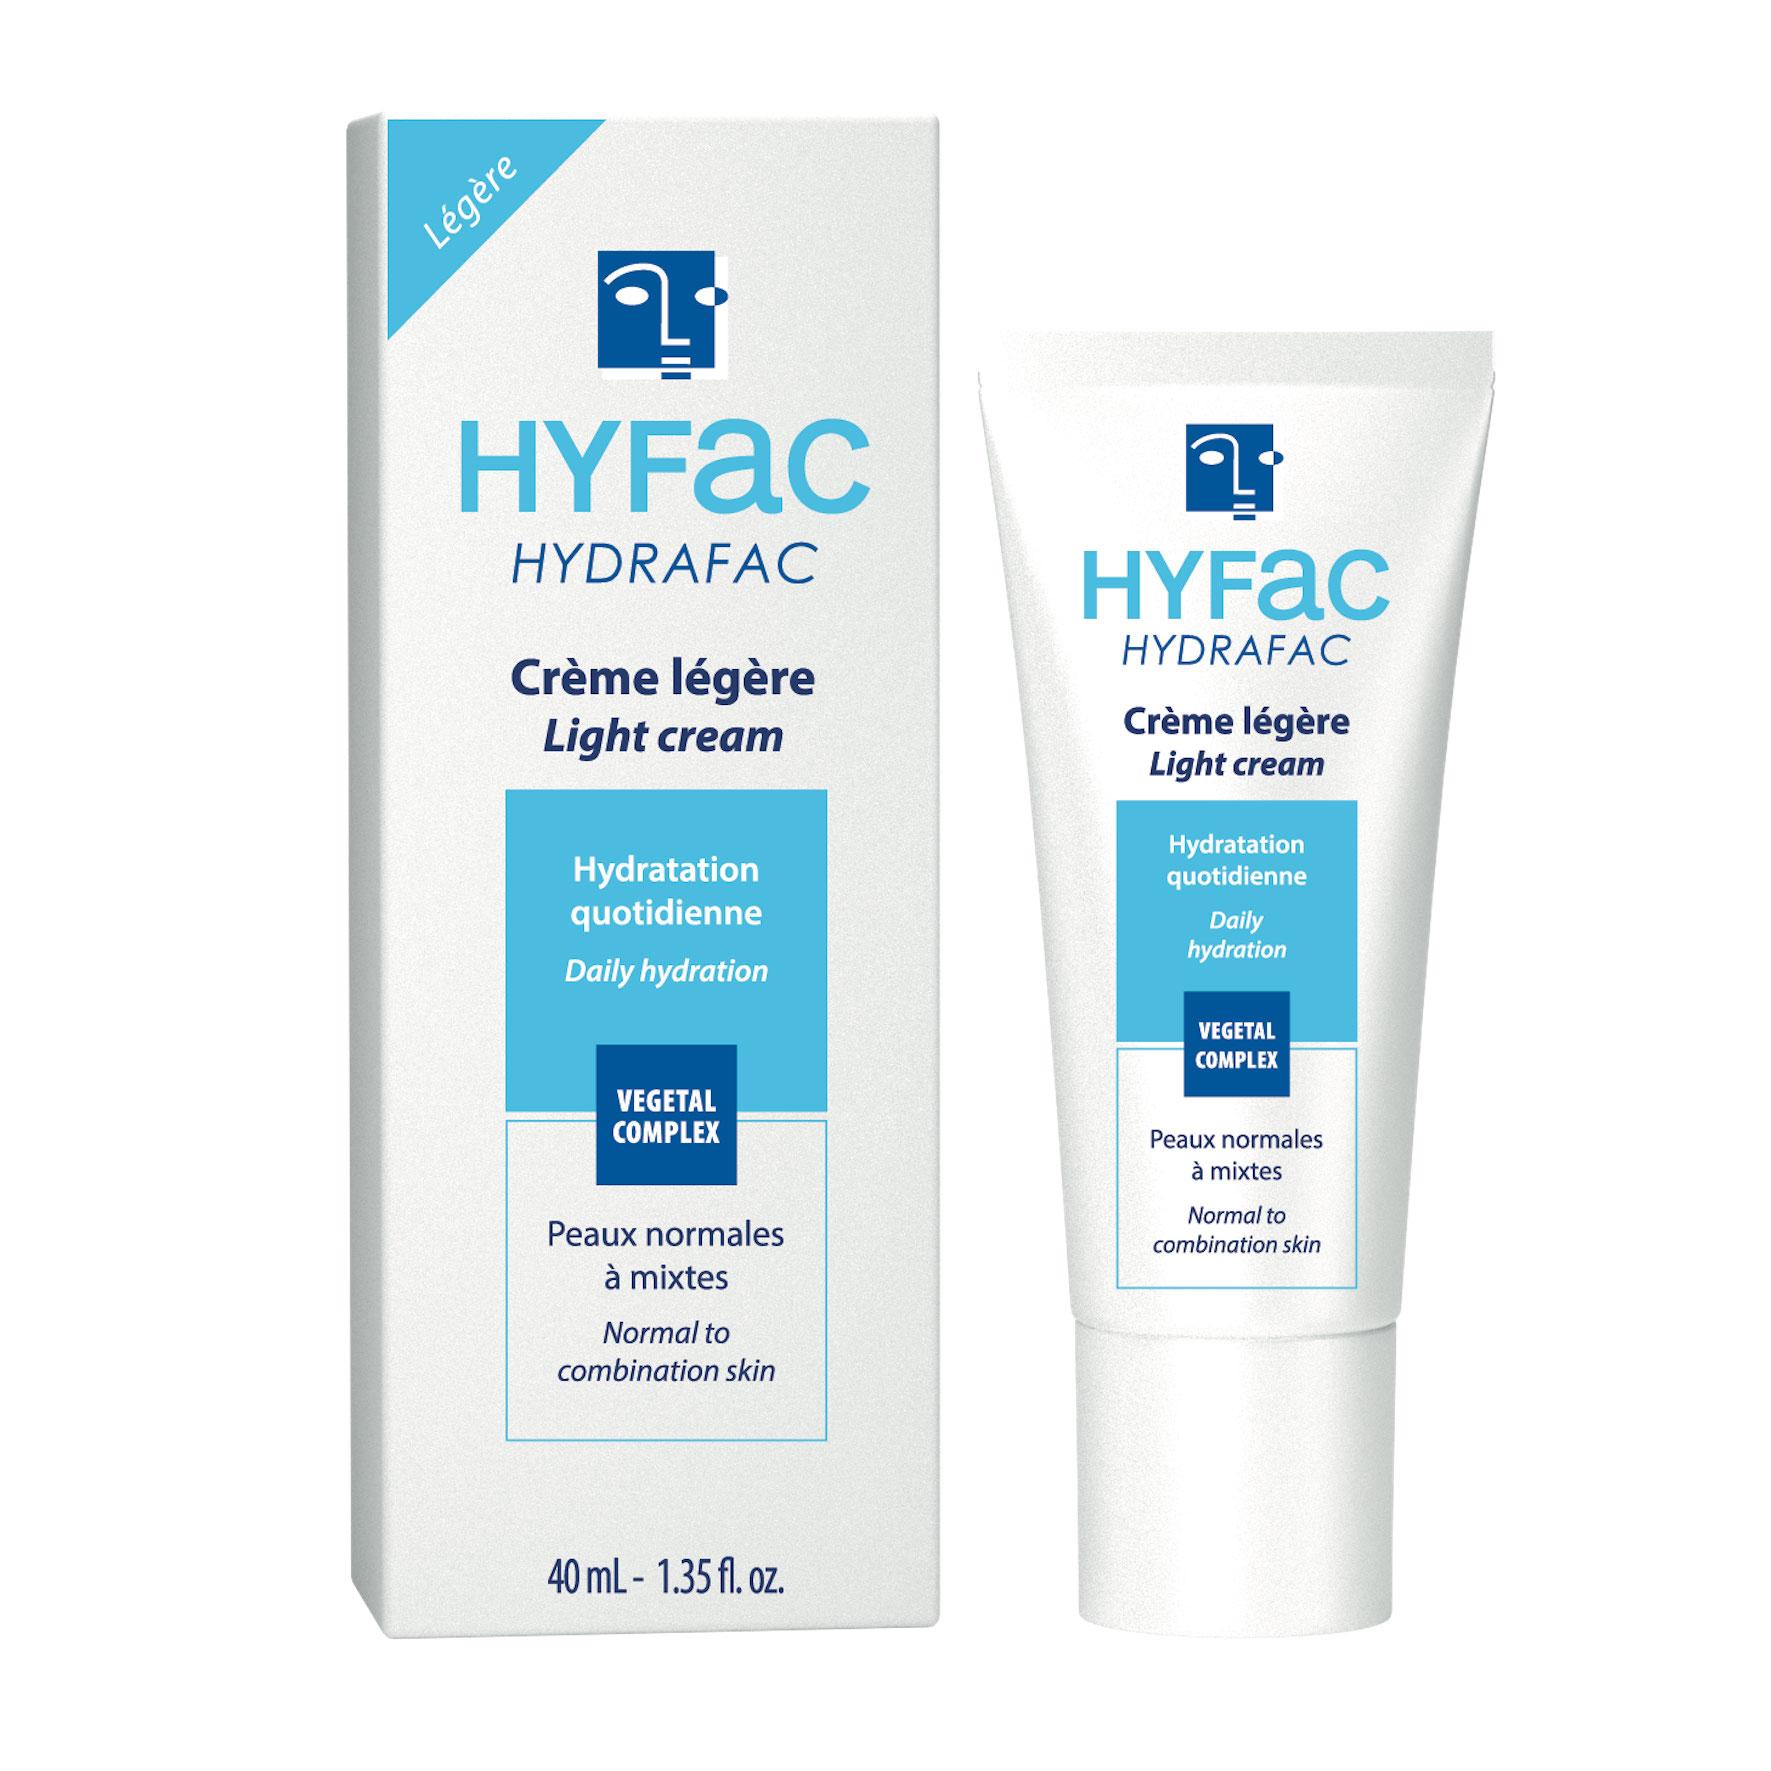 hydrafac-creme-legere